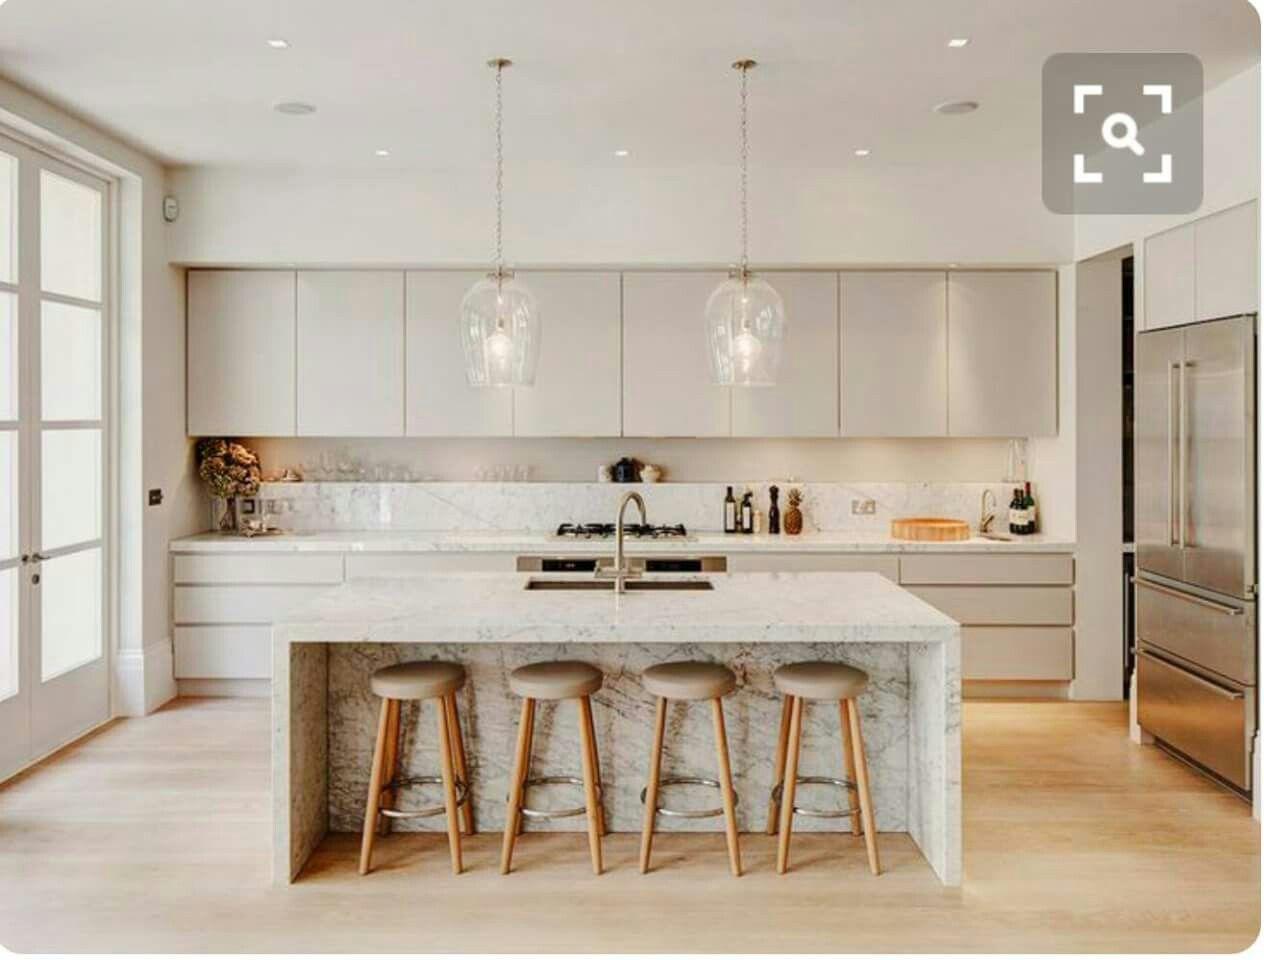 Pin by angela godfrey on renovation inspiration pinterest